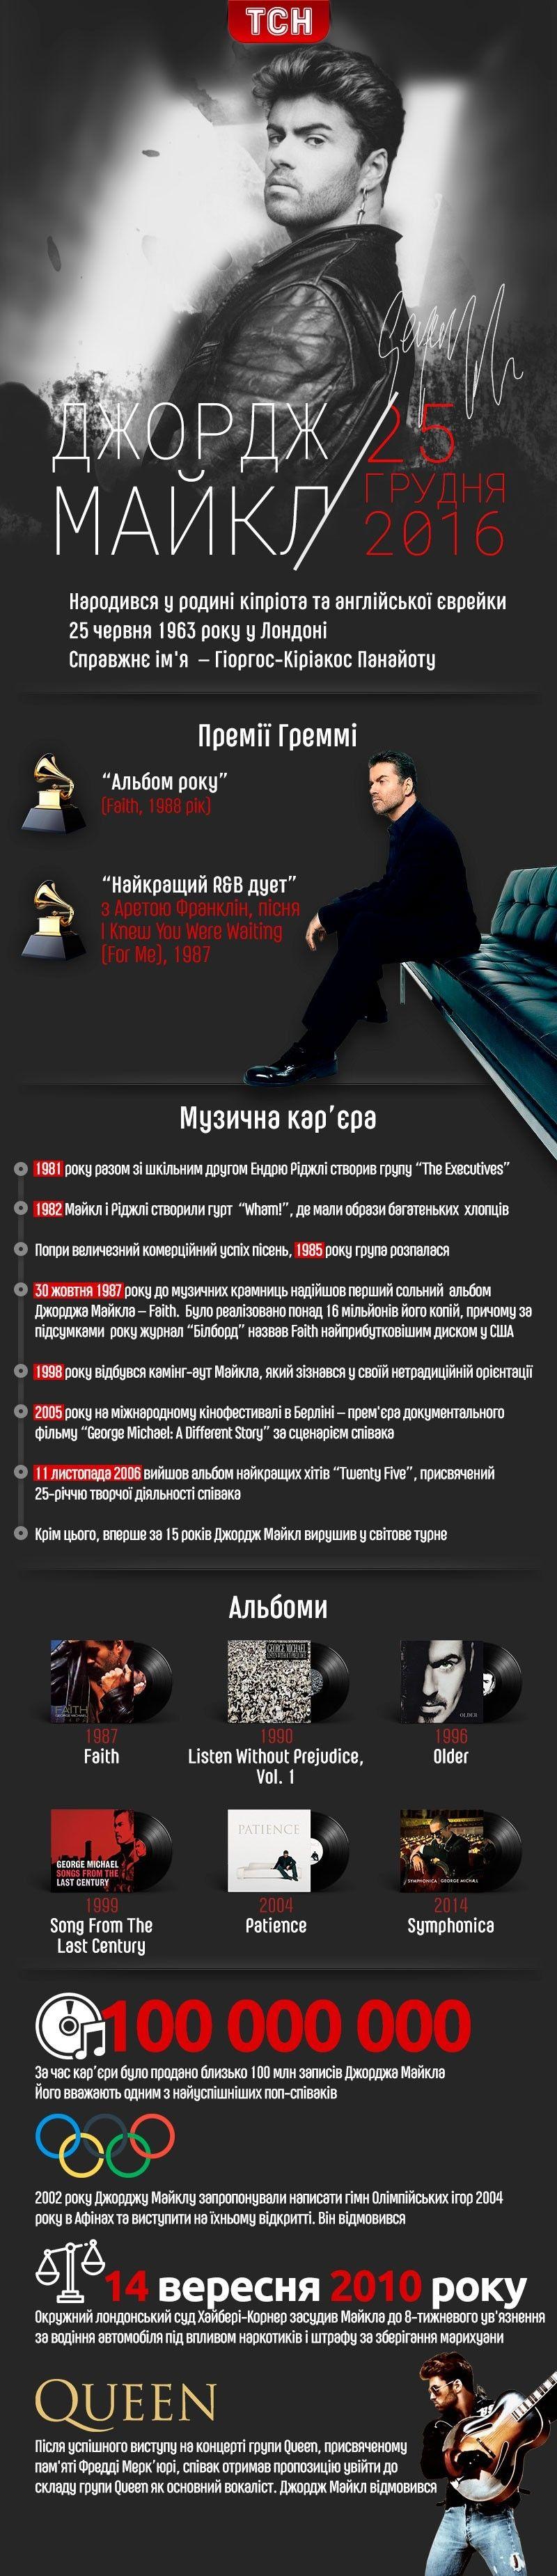 Джордж Майкл, інфографіка